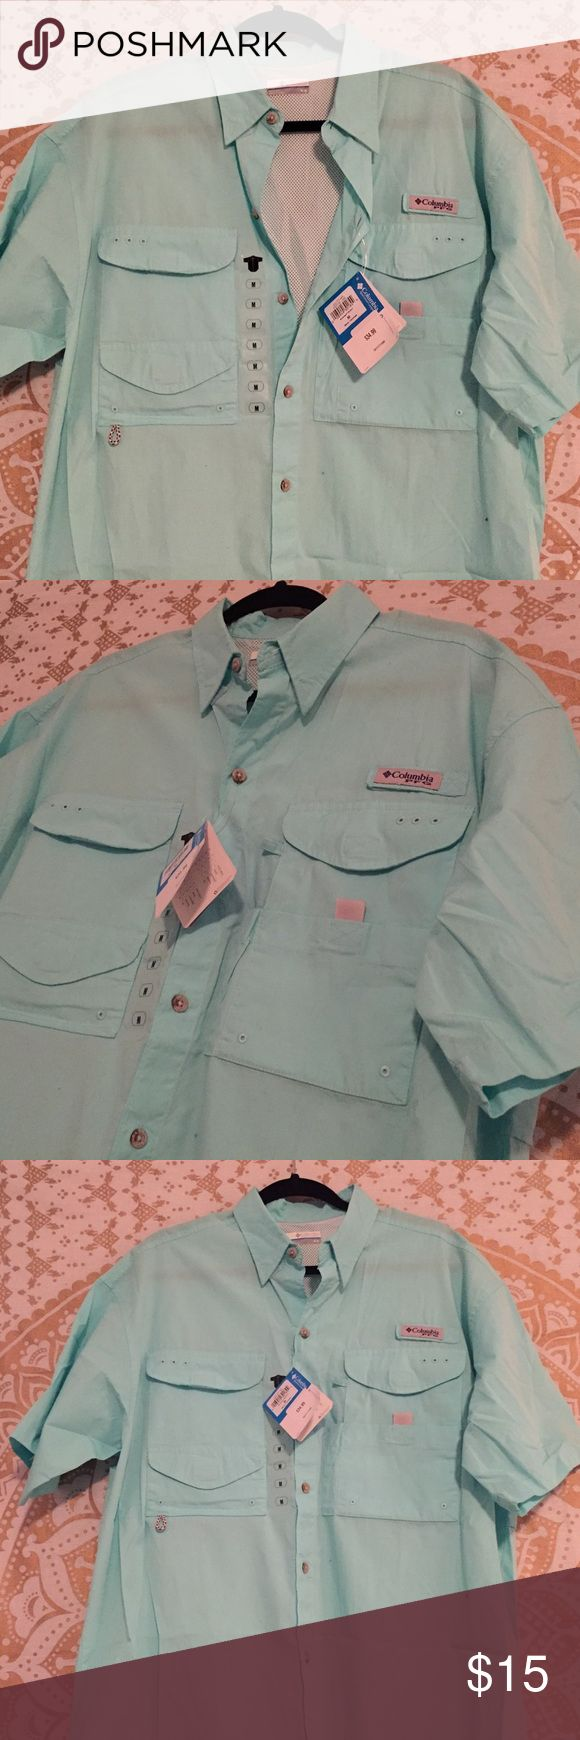 Columbia Fishing Shirt Light blue Columbia fishing shirt. Brand new, just too big for hubby. They do run big, so be cautious! Great for the upcoming season!☀️🐟 Columbia Shirts Casual Button Down Shirts